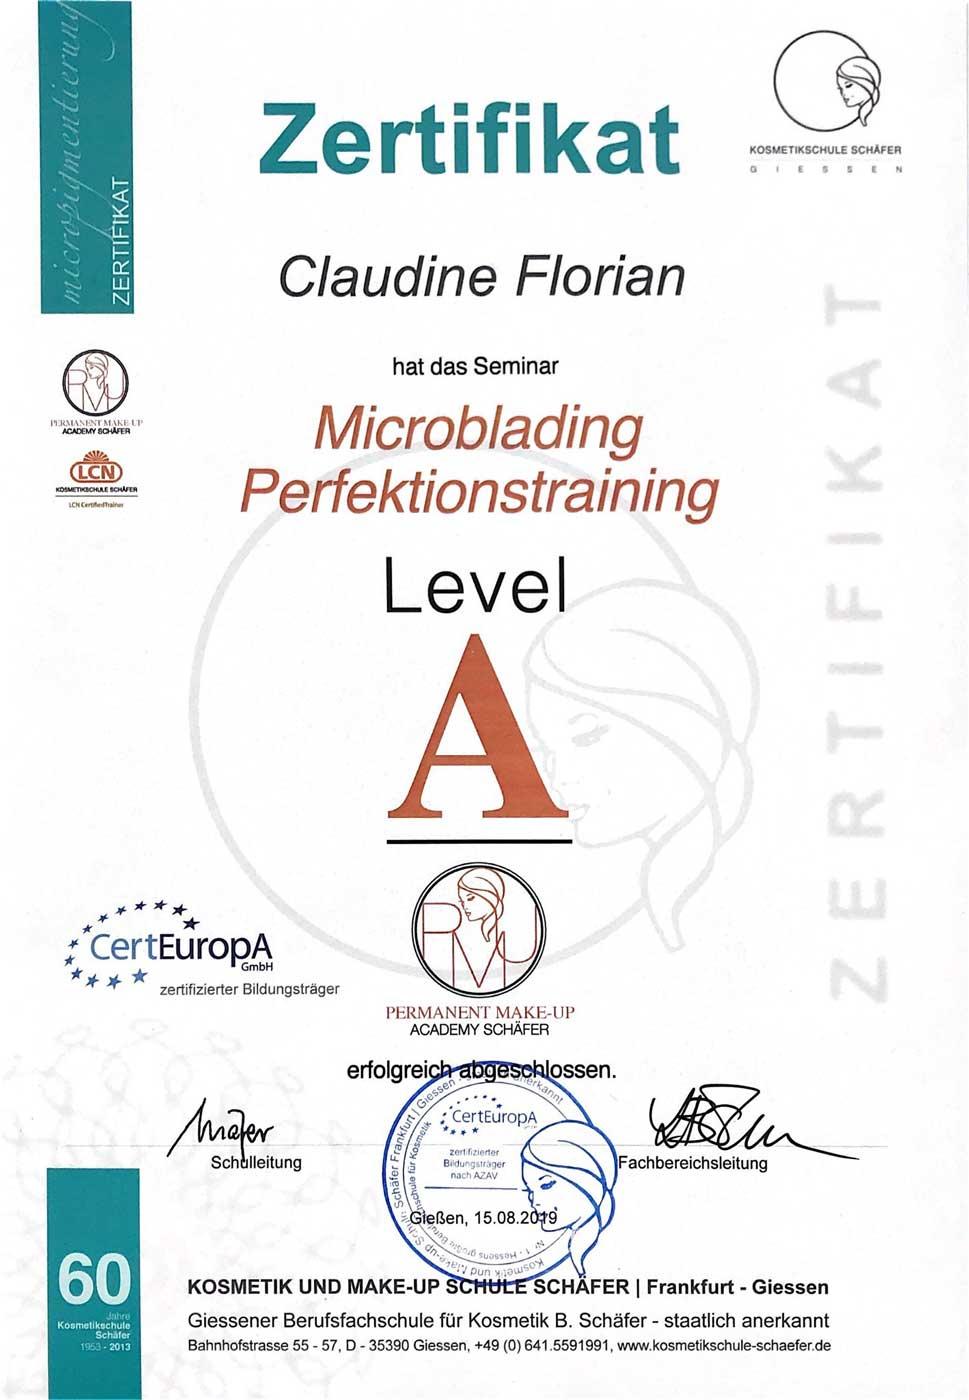 zertifikat_microblading